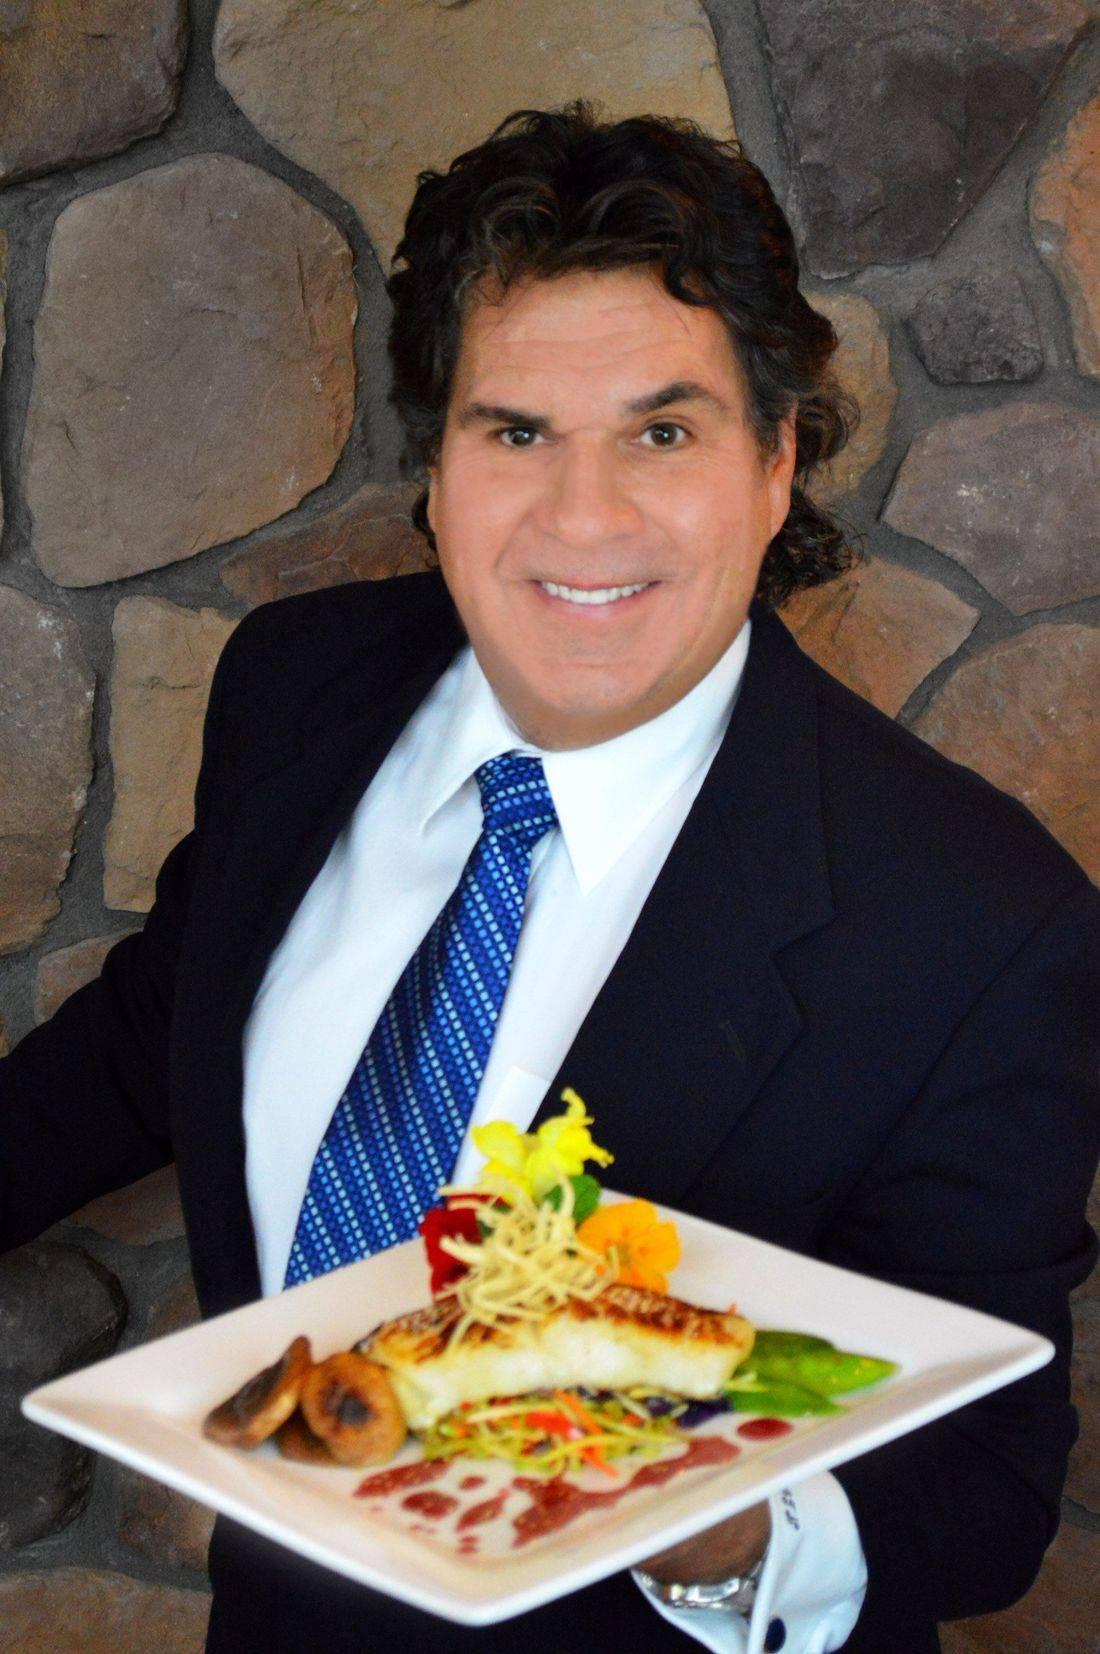 Celebrity Chef Jimmy Nadell